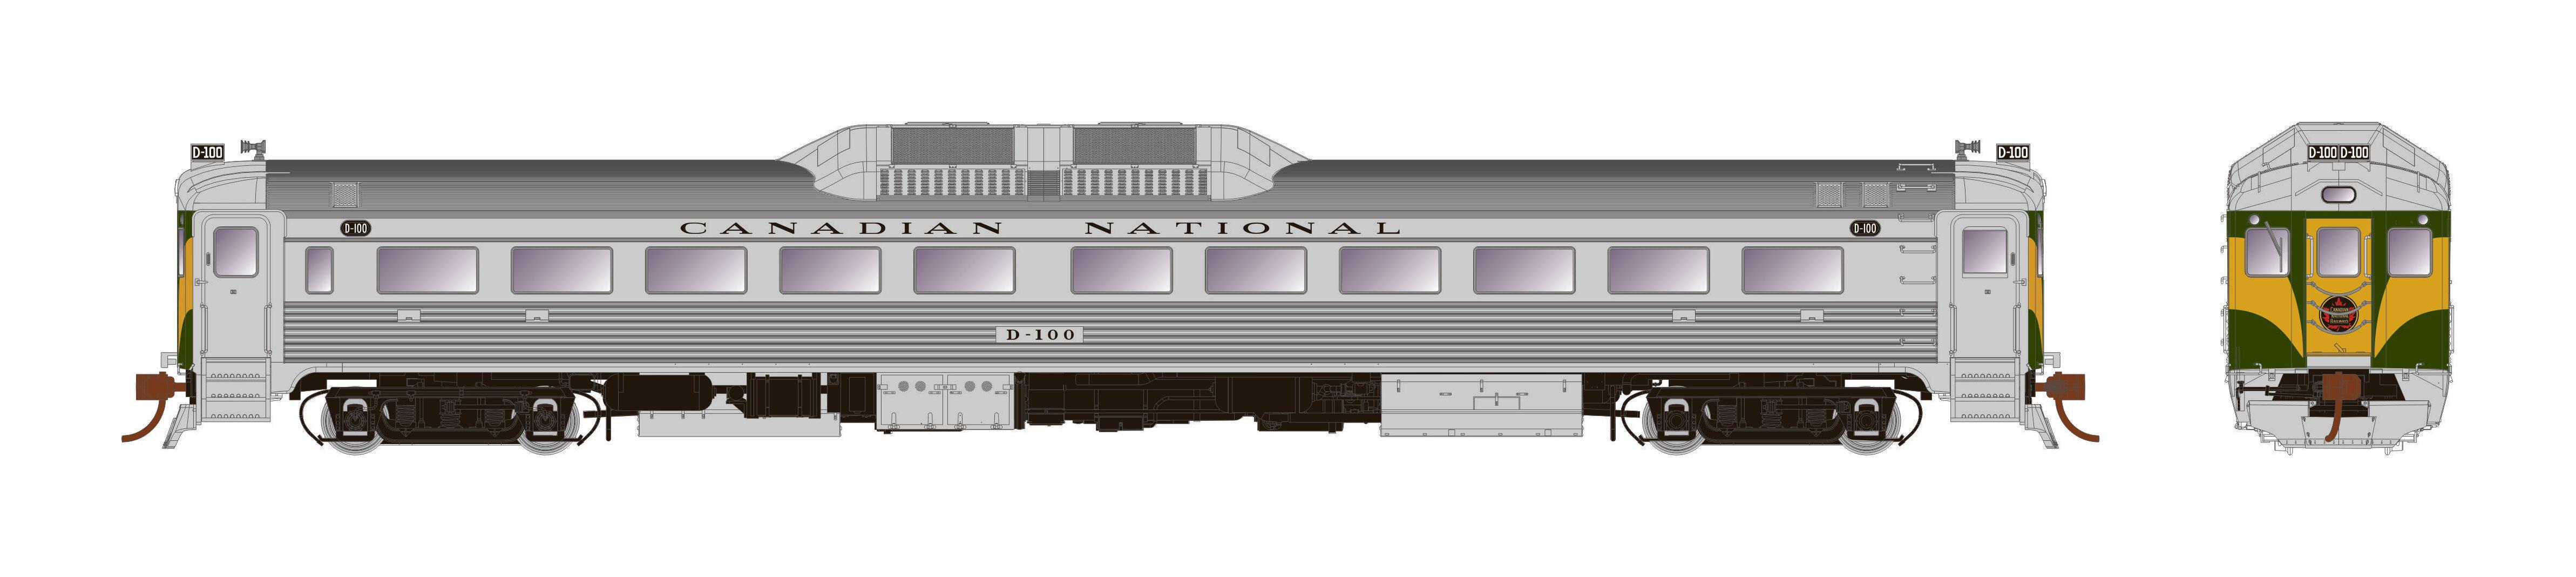 Rapido Trains 16710 - HO Budd RDC-1 - PH1b - DCC/Sound - Canadian National #D101